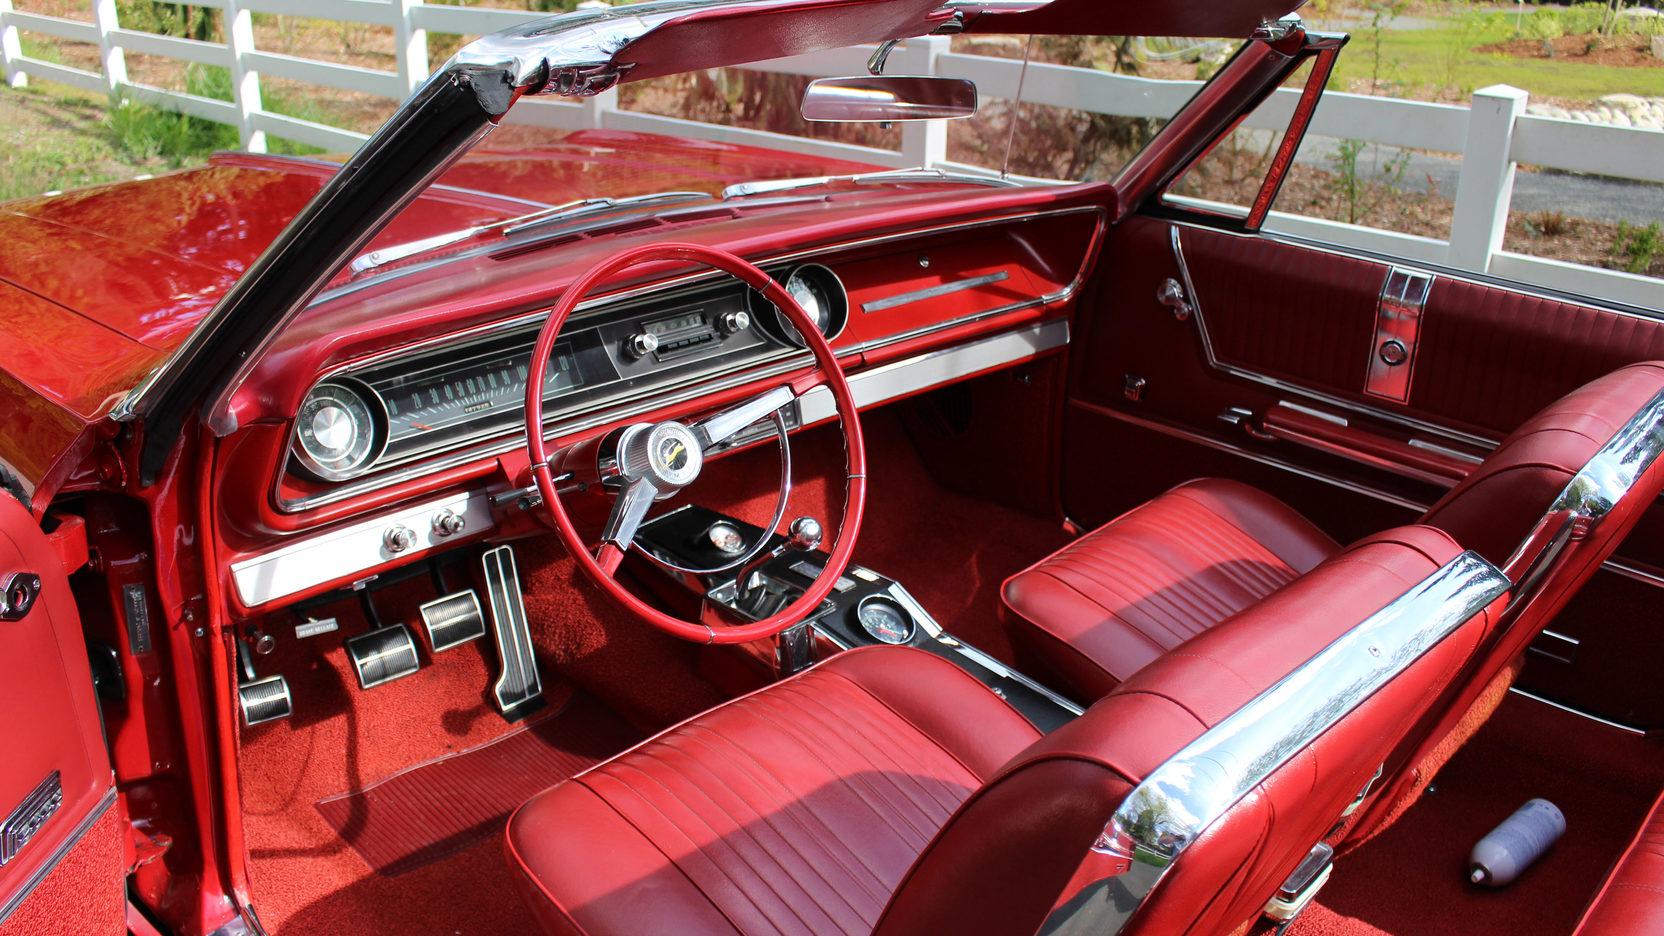 1957 Chevy Impala Ss Convertible